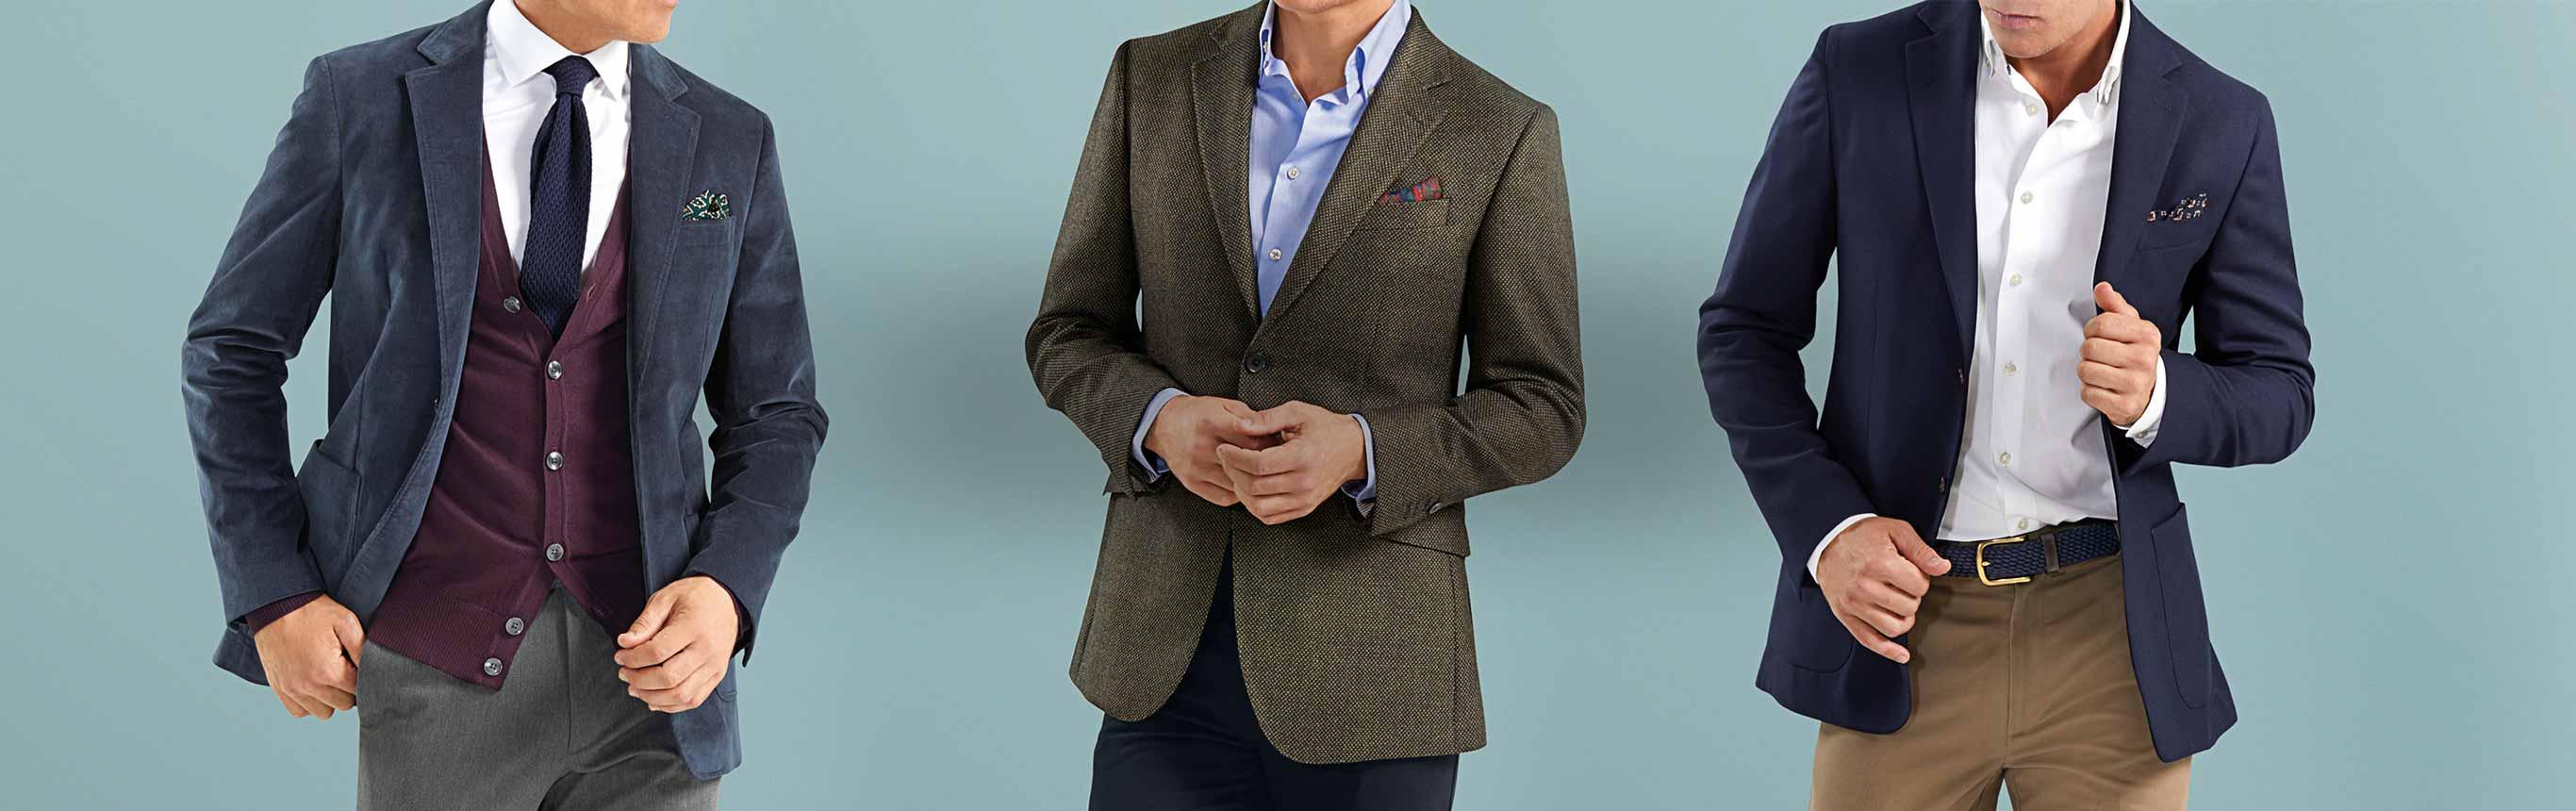 Charles james 38 jersey jacket for Mens dress shirts charles tyrwhitt